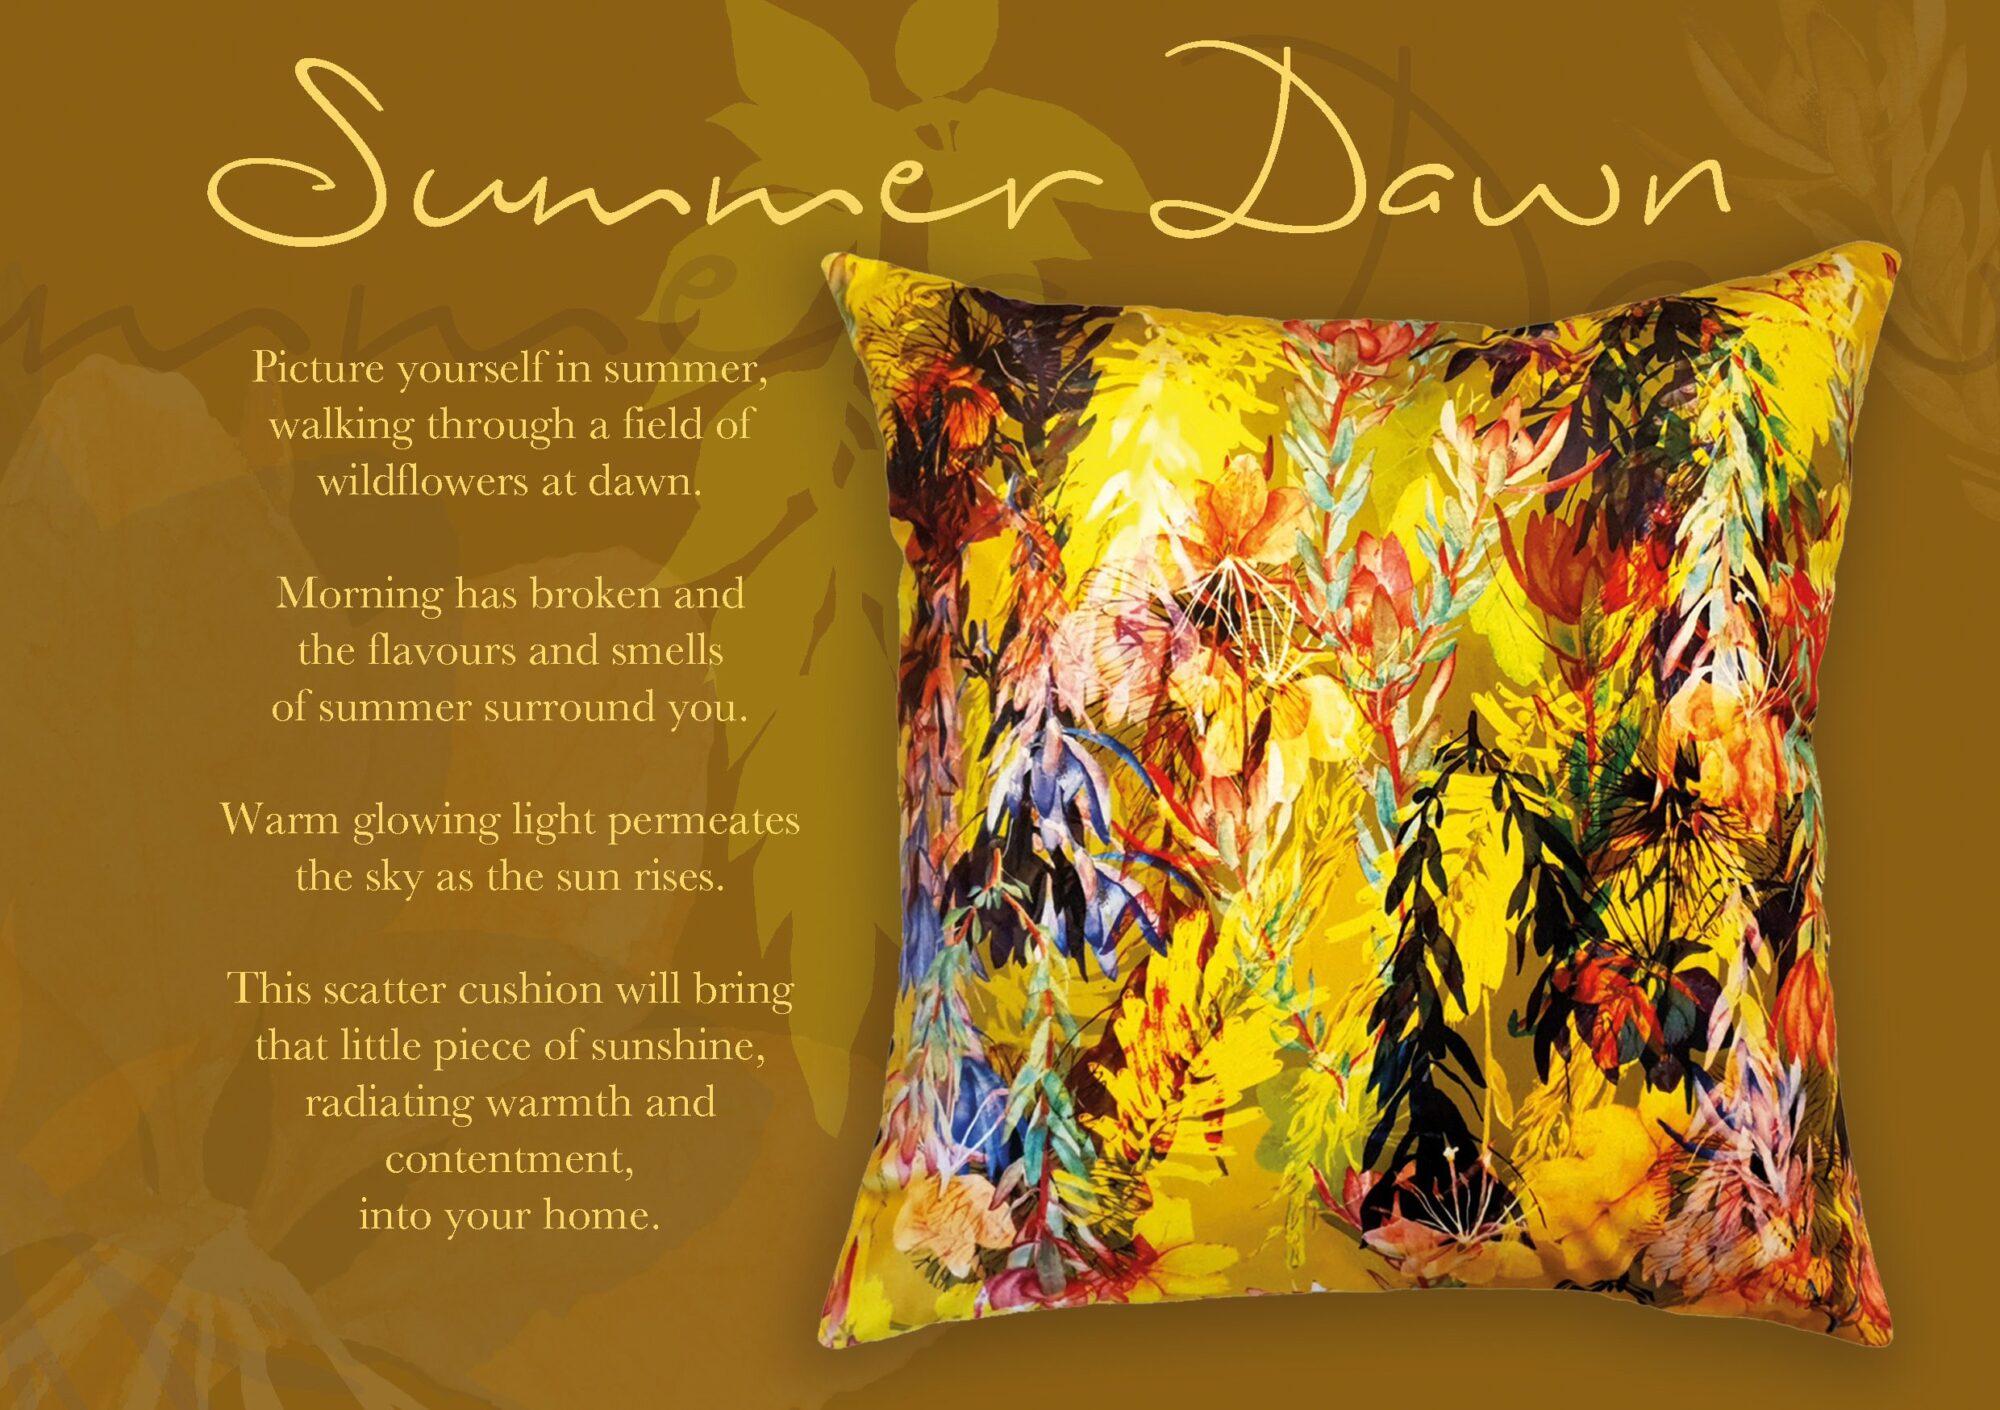 Summer dawn Scatter Cushion | IV Fashion Design